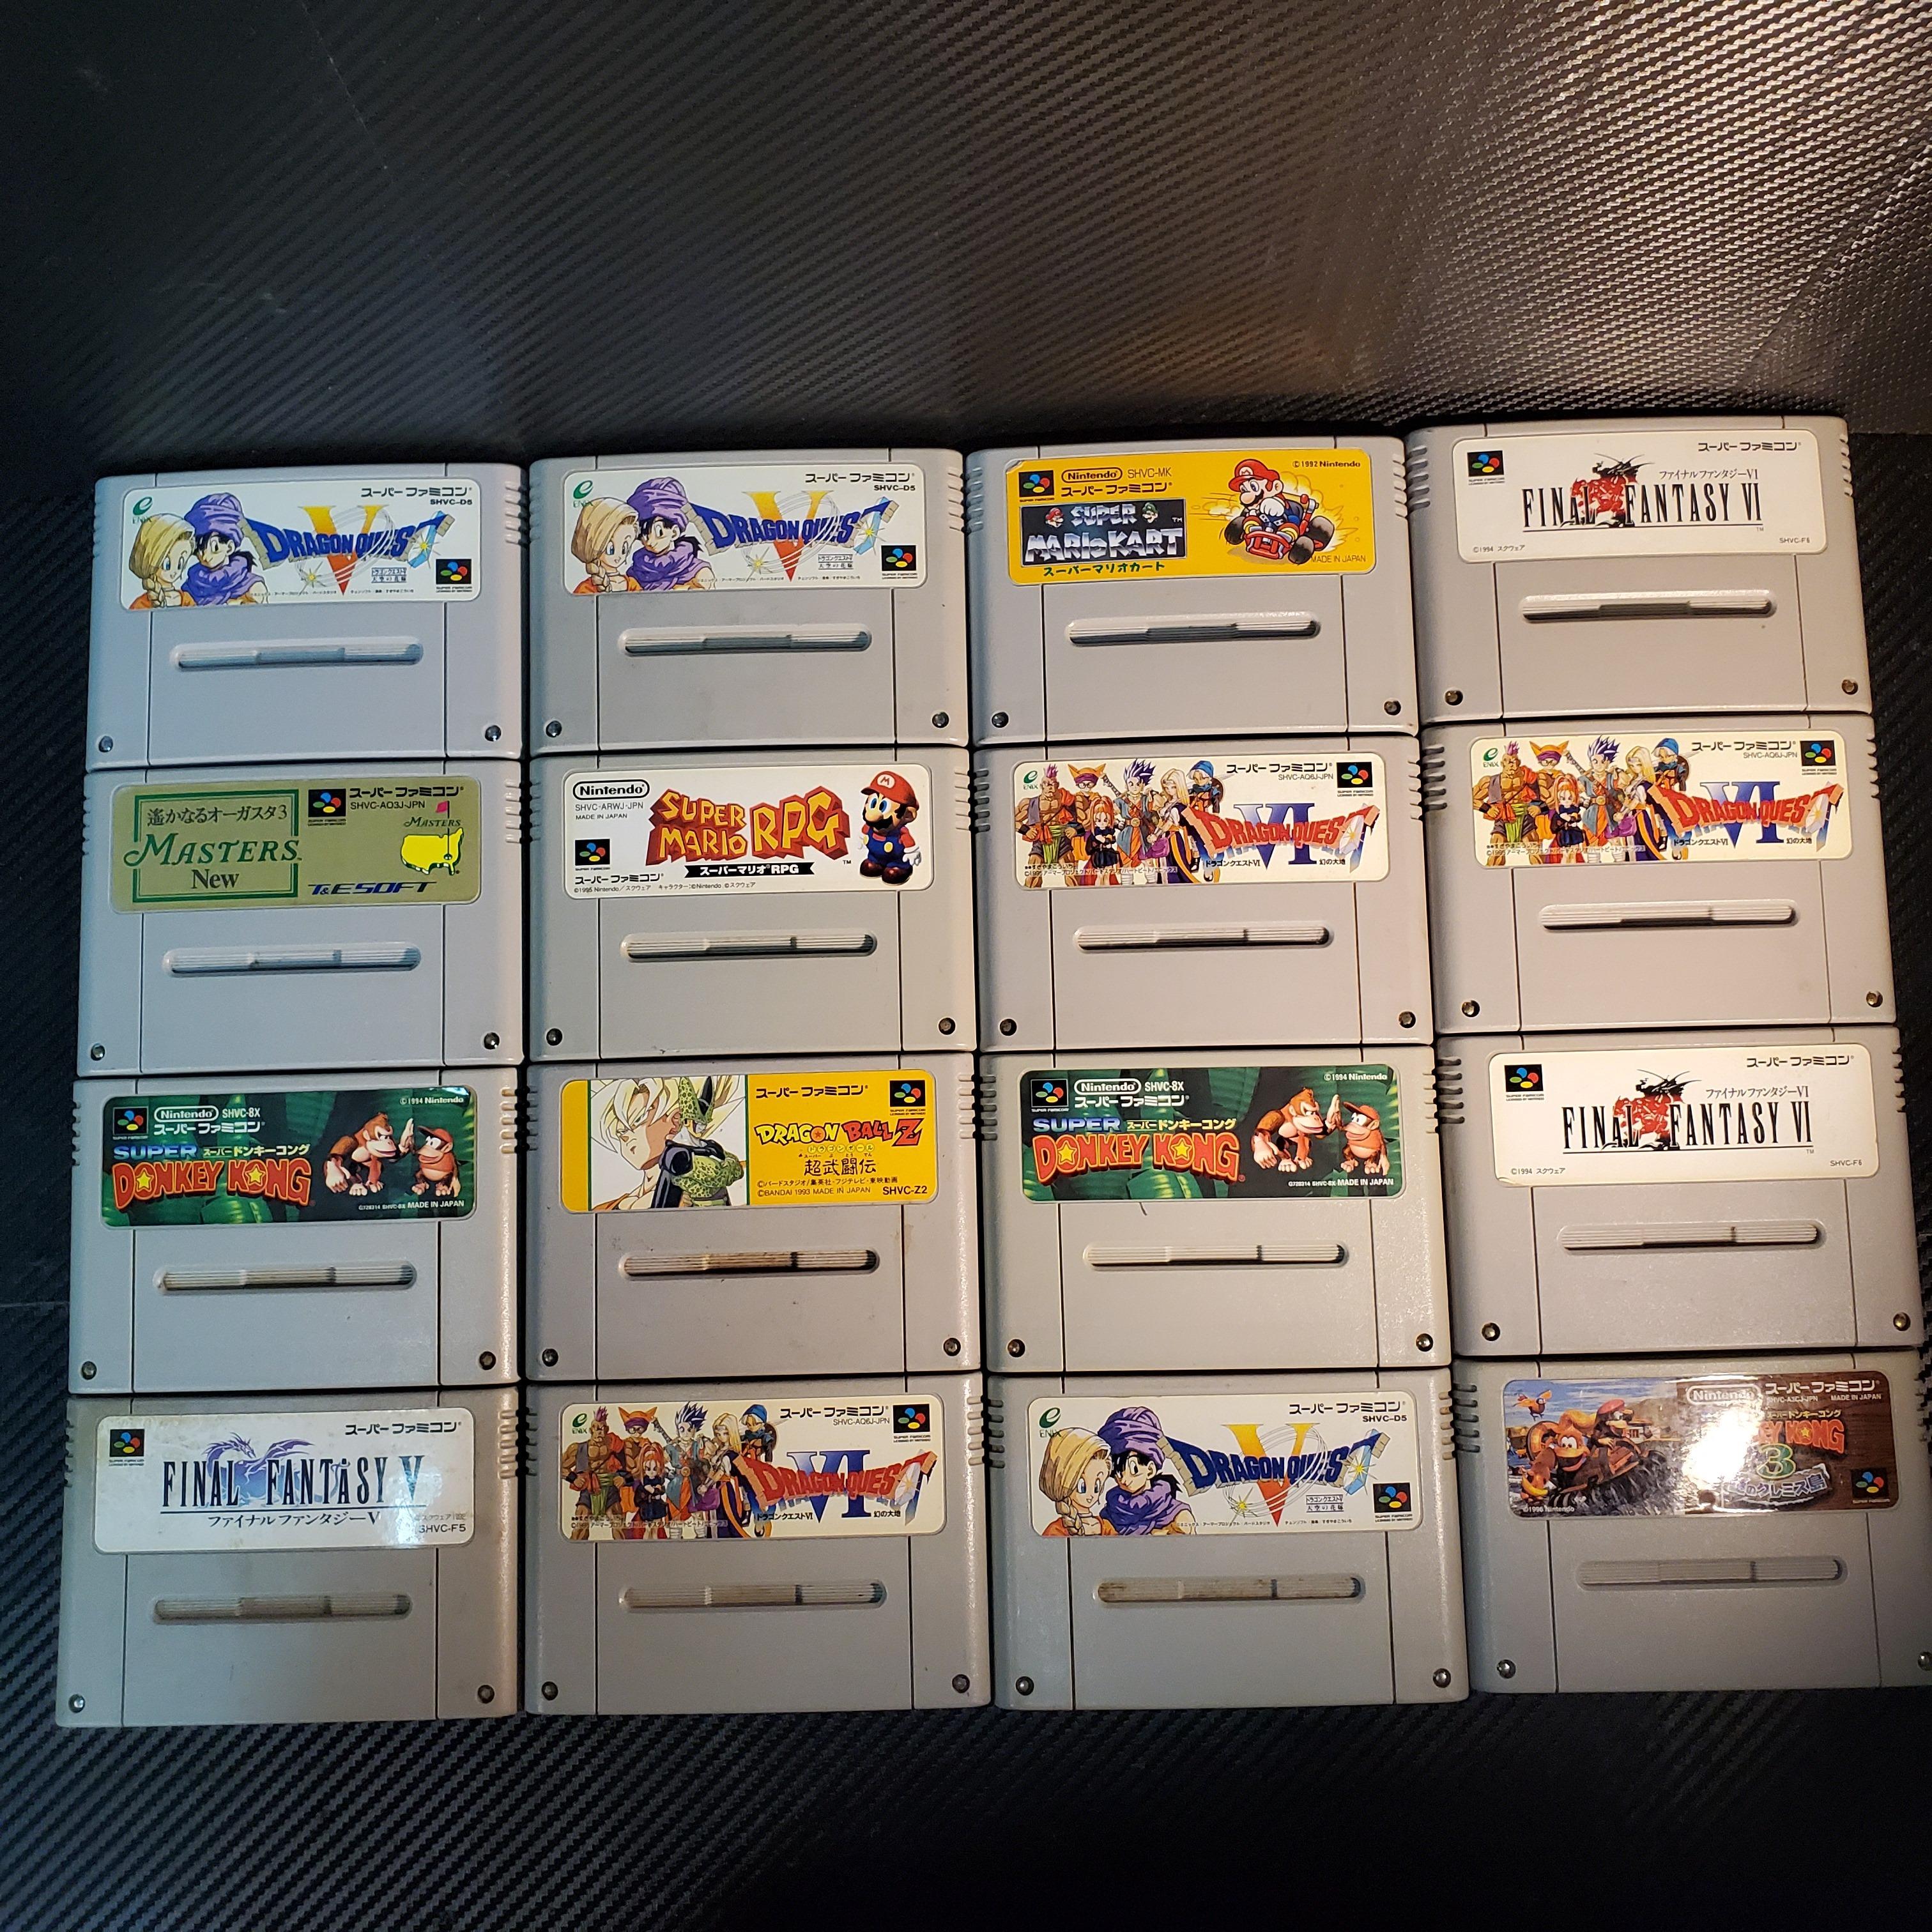 [VDS] Nostalgeek Store — Super Famicom / GBA / GB / Nintendo 64 / GameCube 201005105047626605